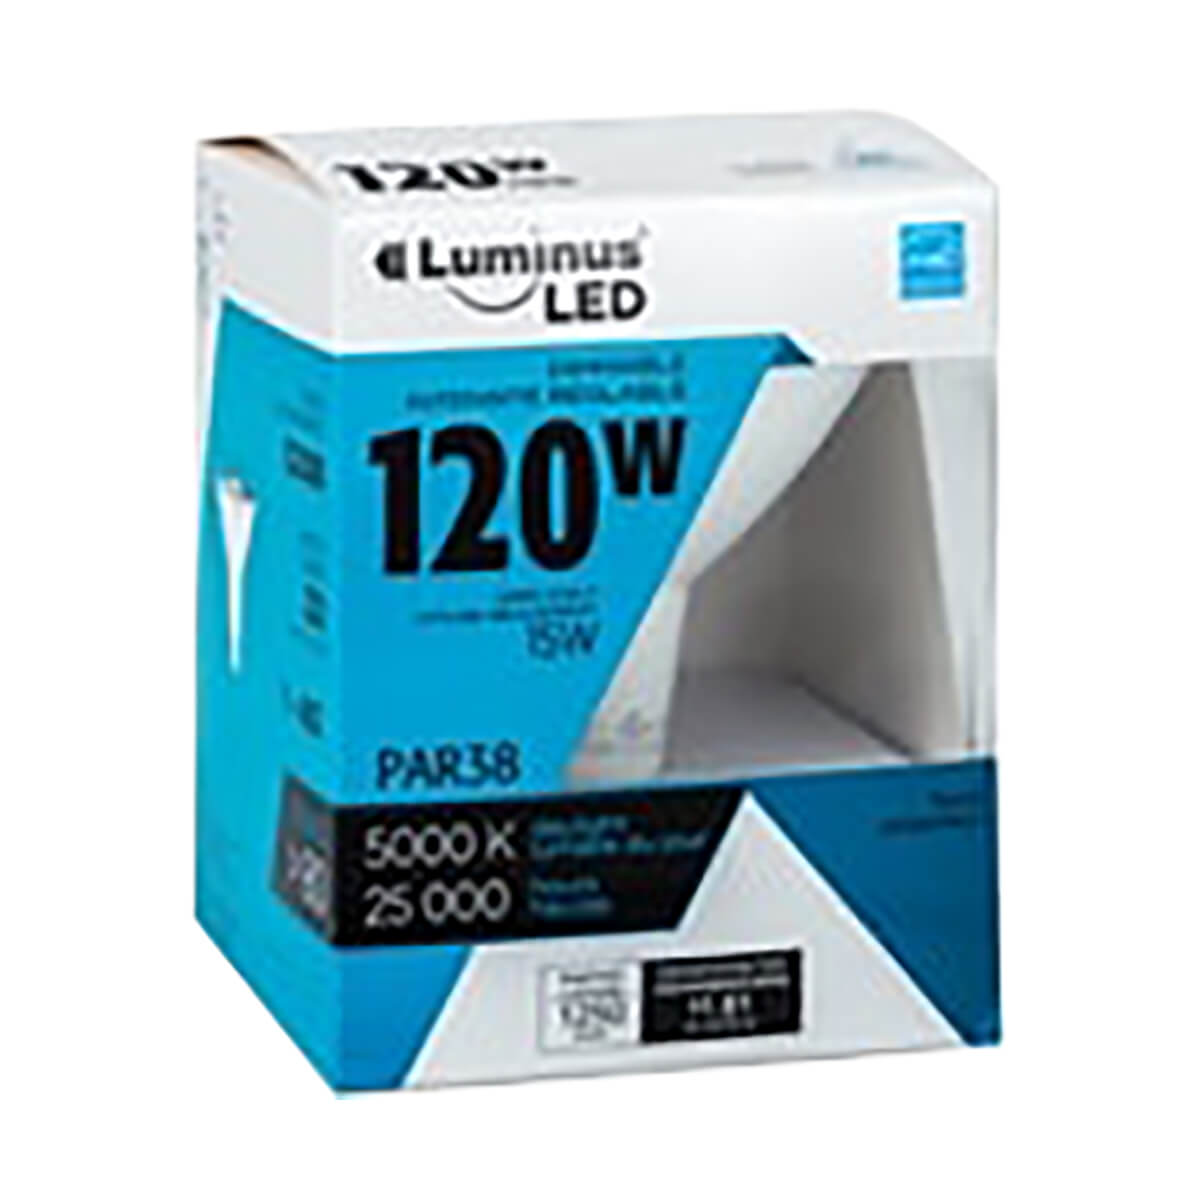 Luminus LED Bulb PAR38 - Dimmable - Day Light - 17W